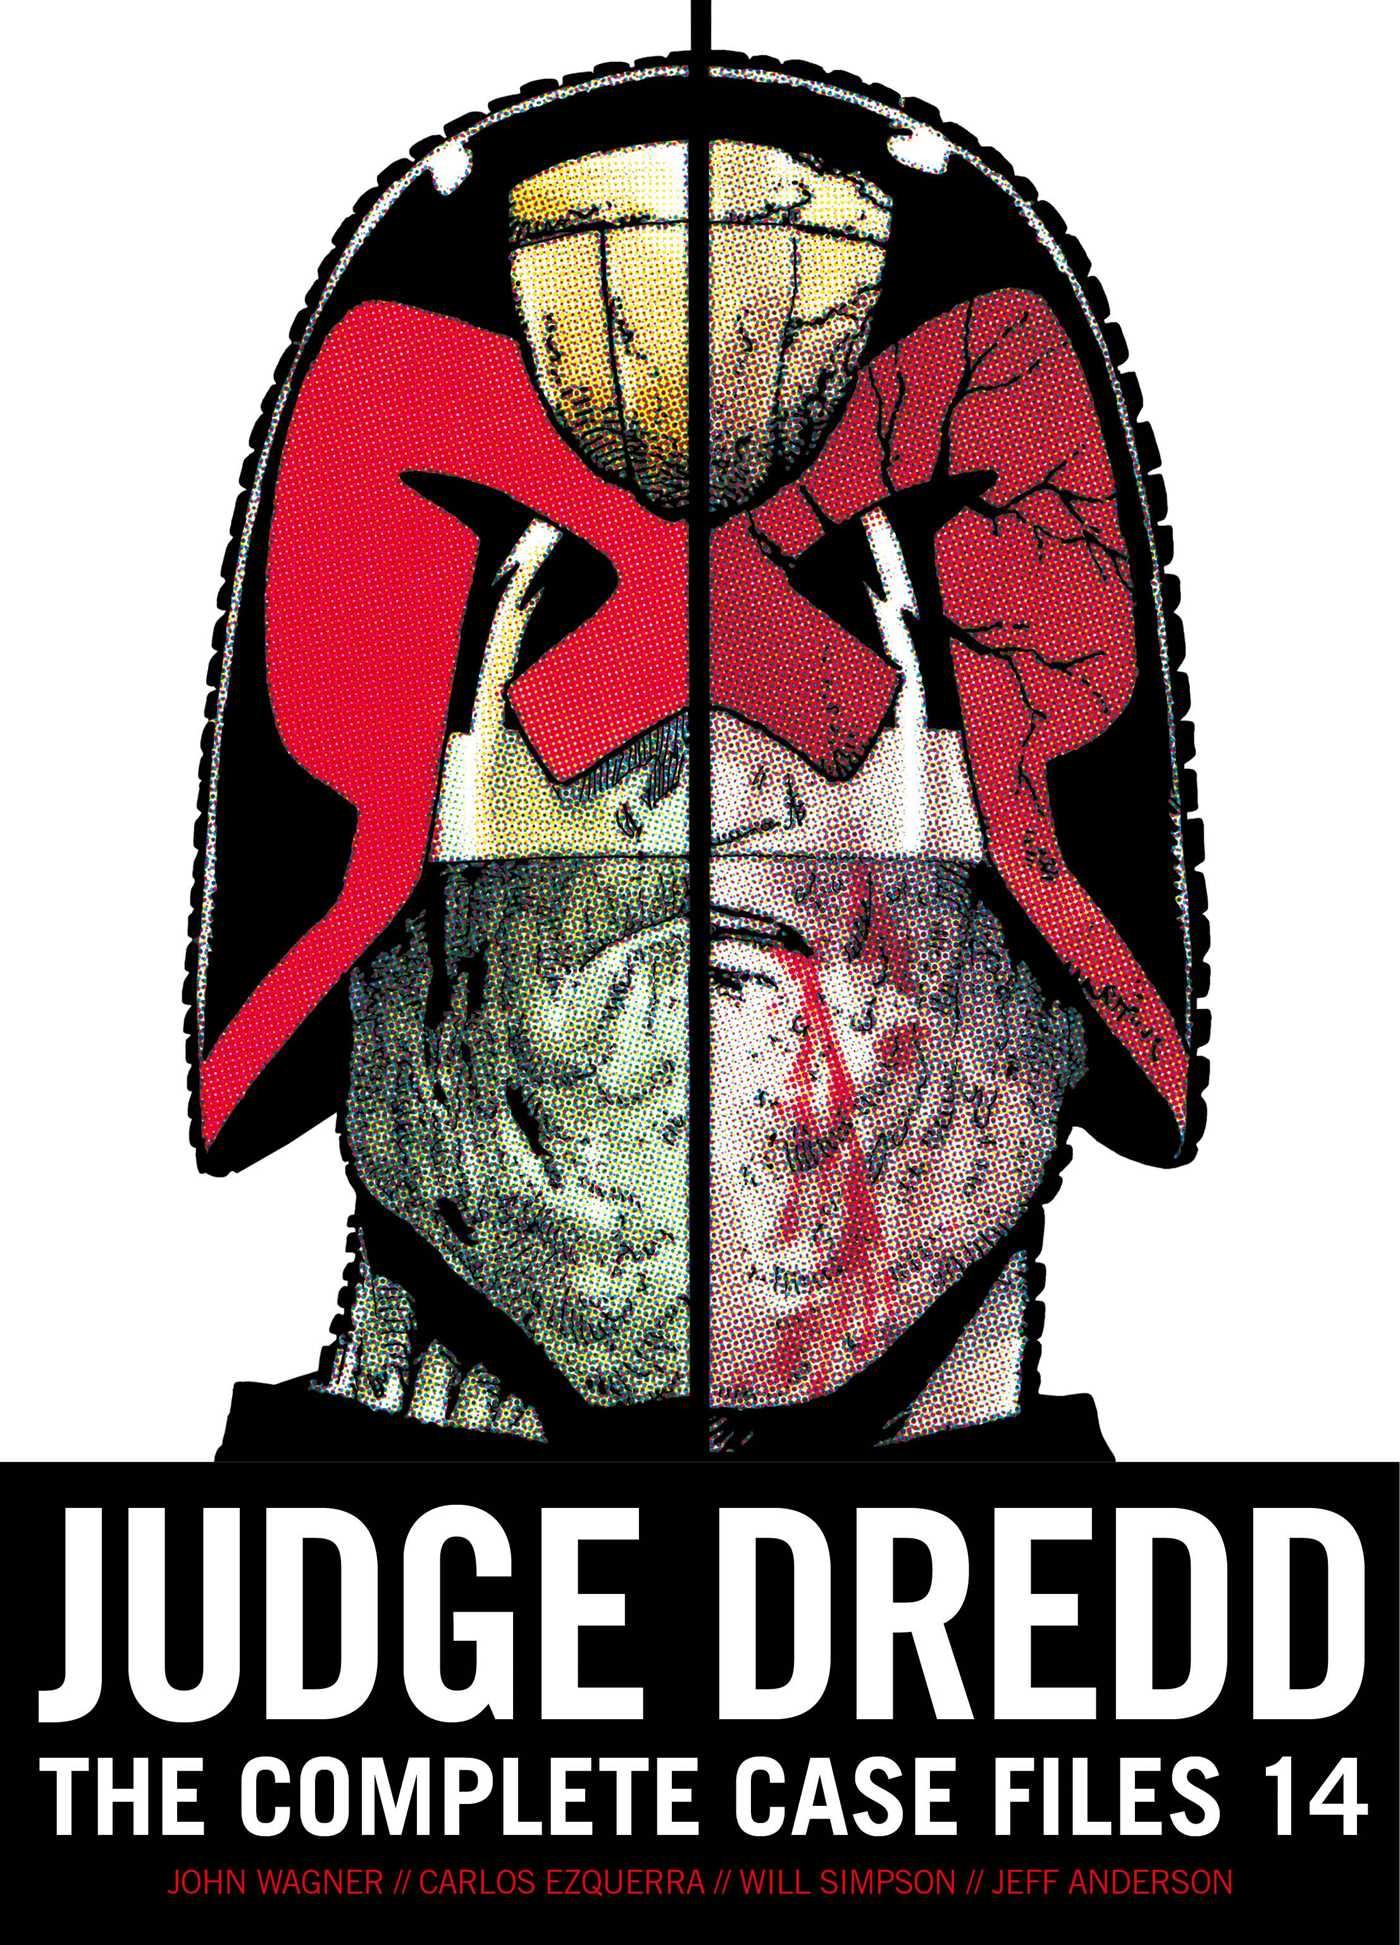 Judge dredd the complete case files 14 9781781085479 hr